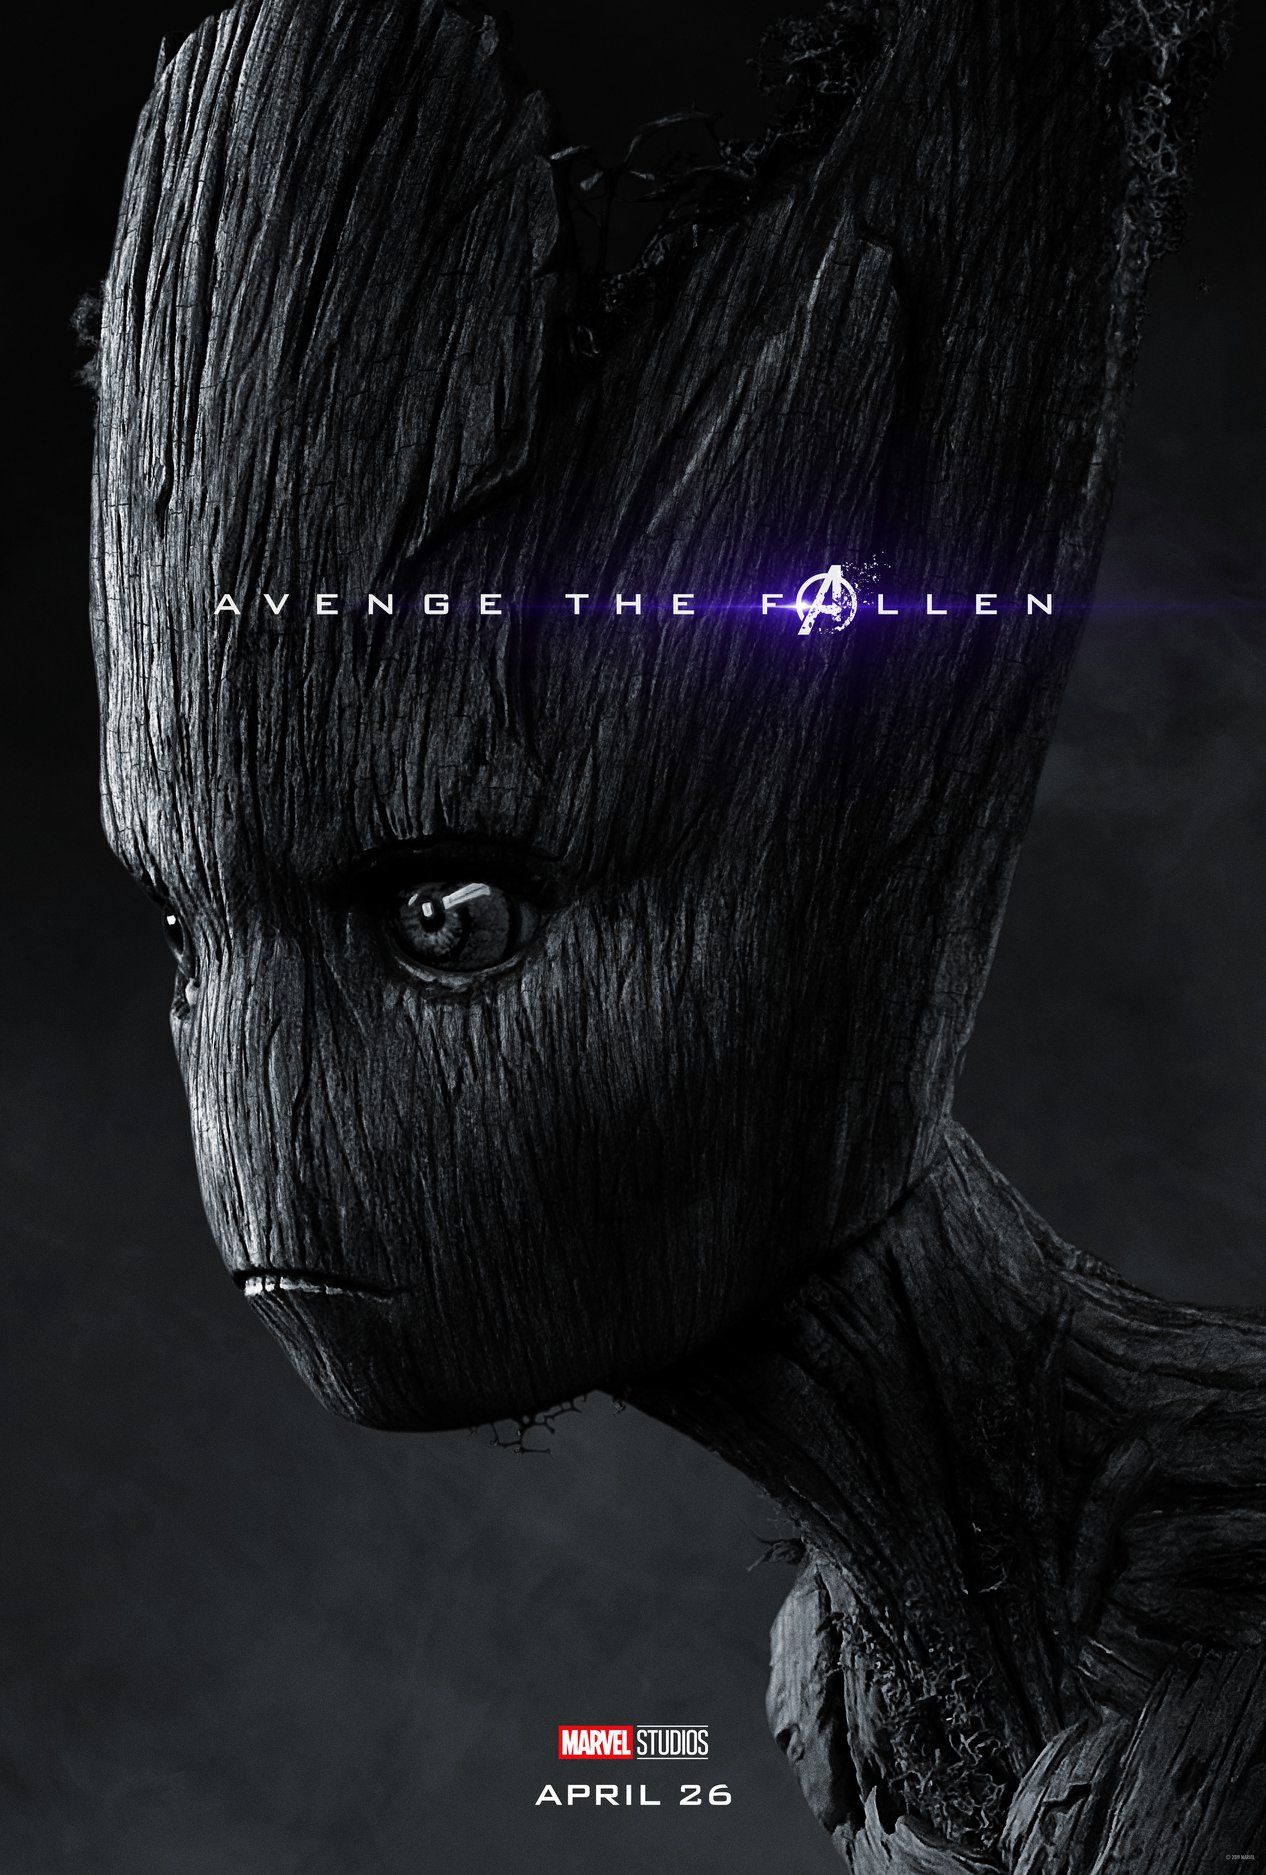 avengers_endgame_p30.png